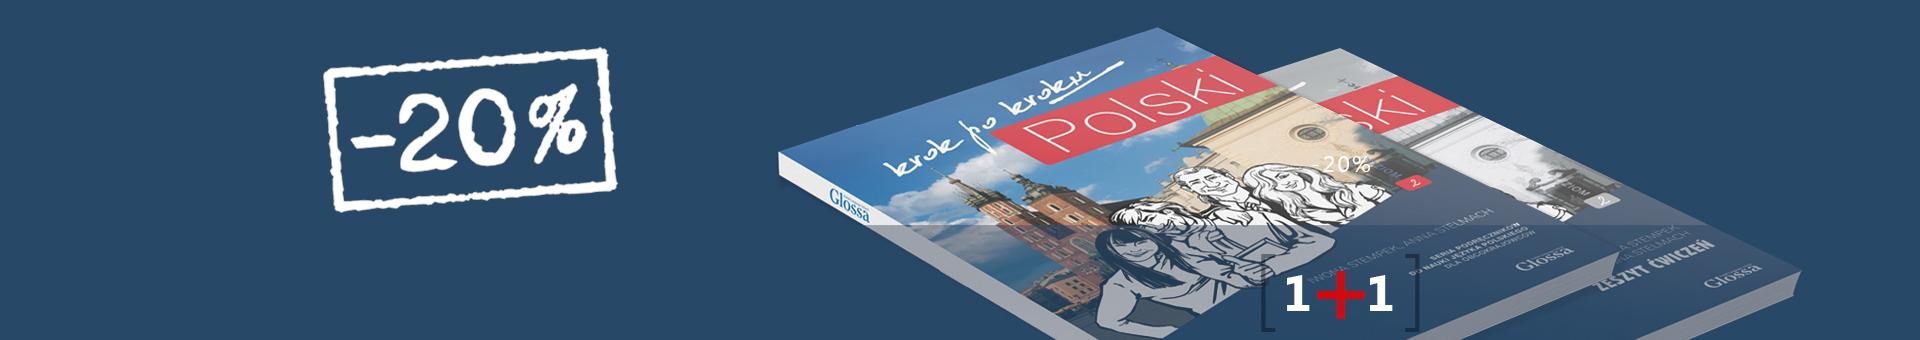 Pakiet: POLSKI krok po kroku 2